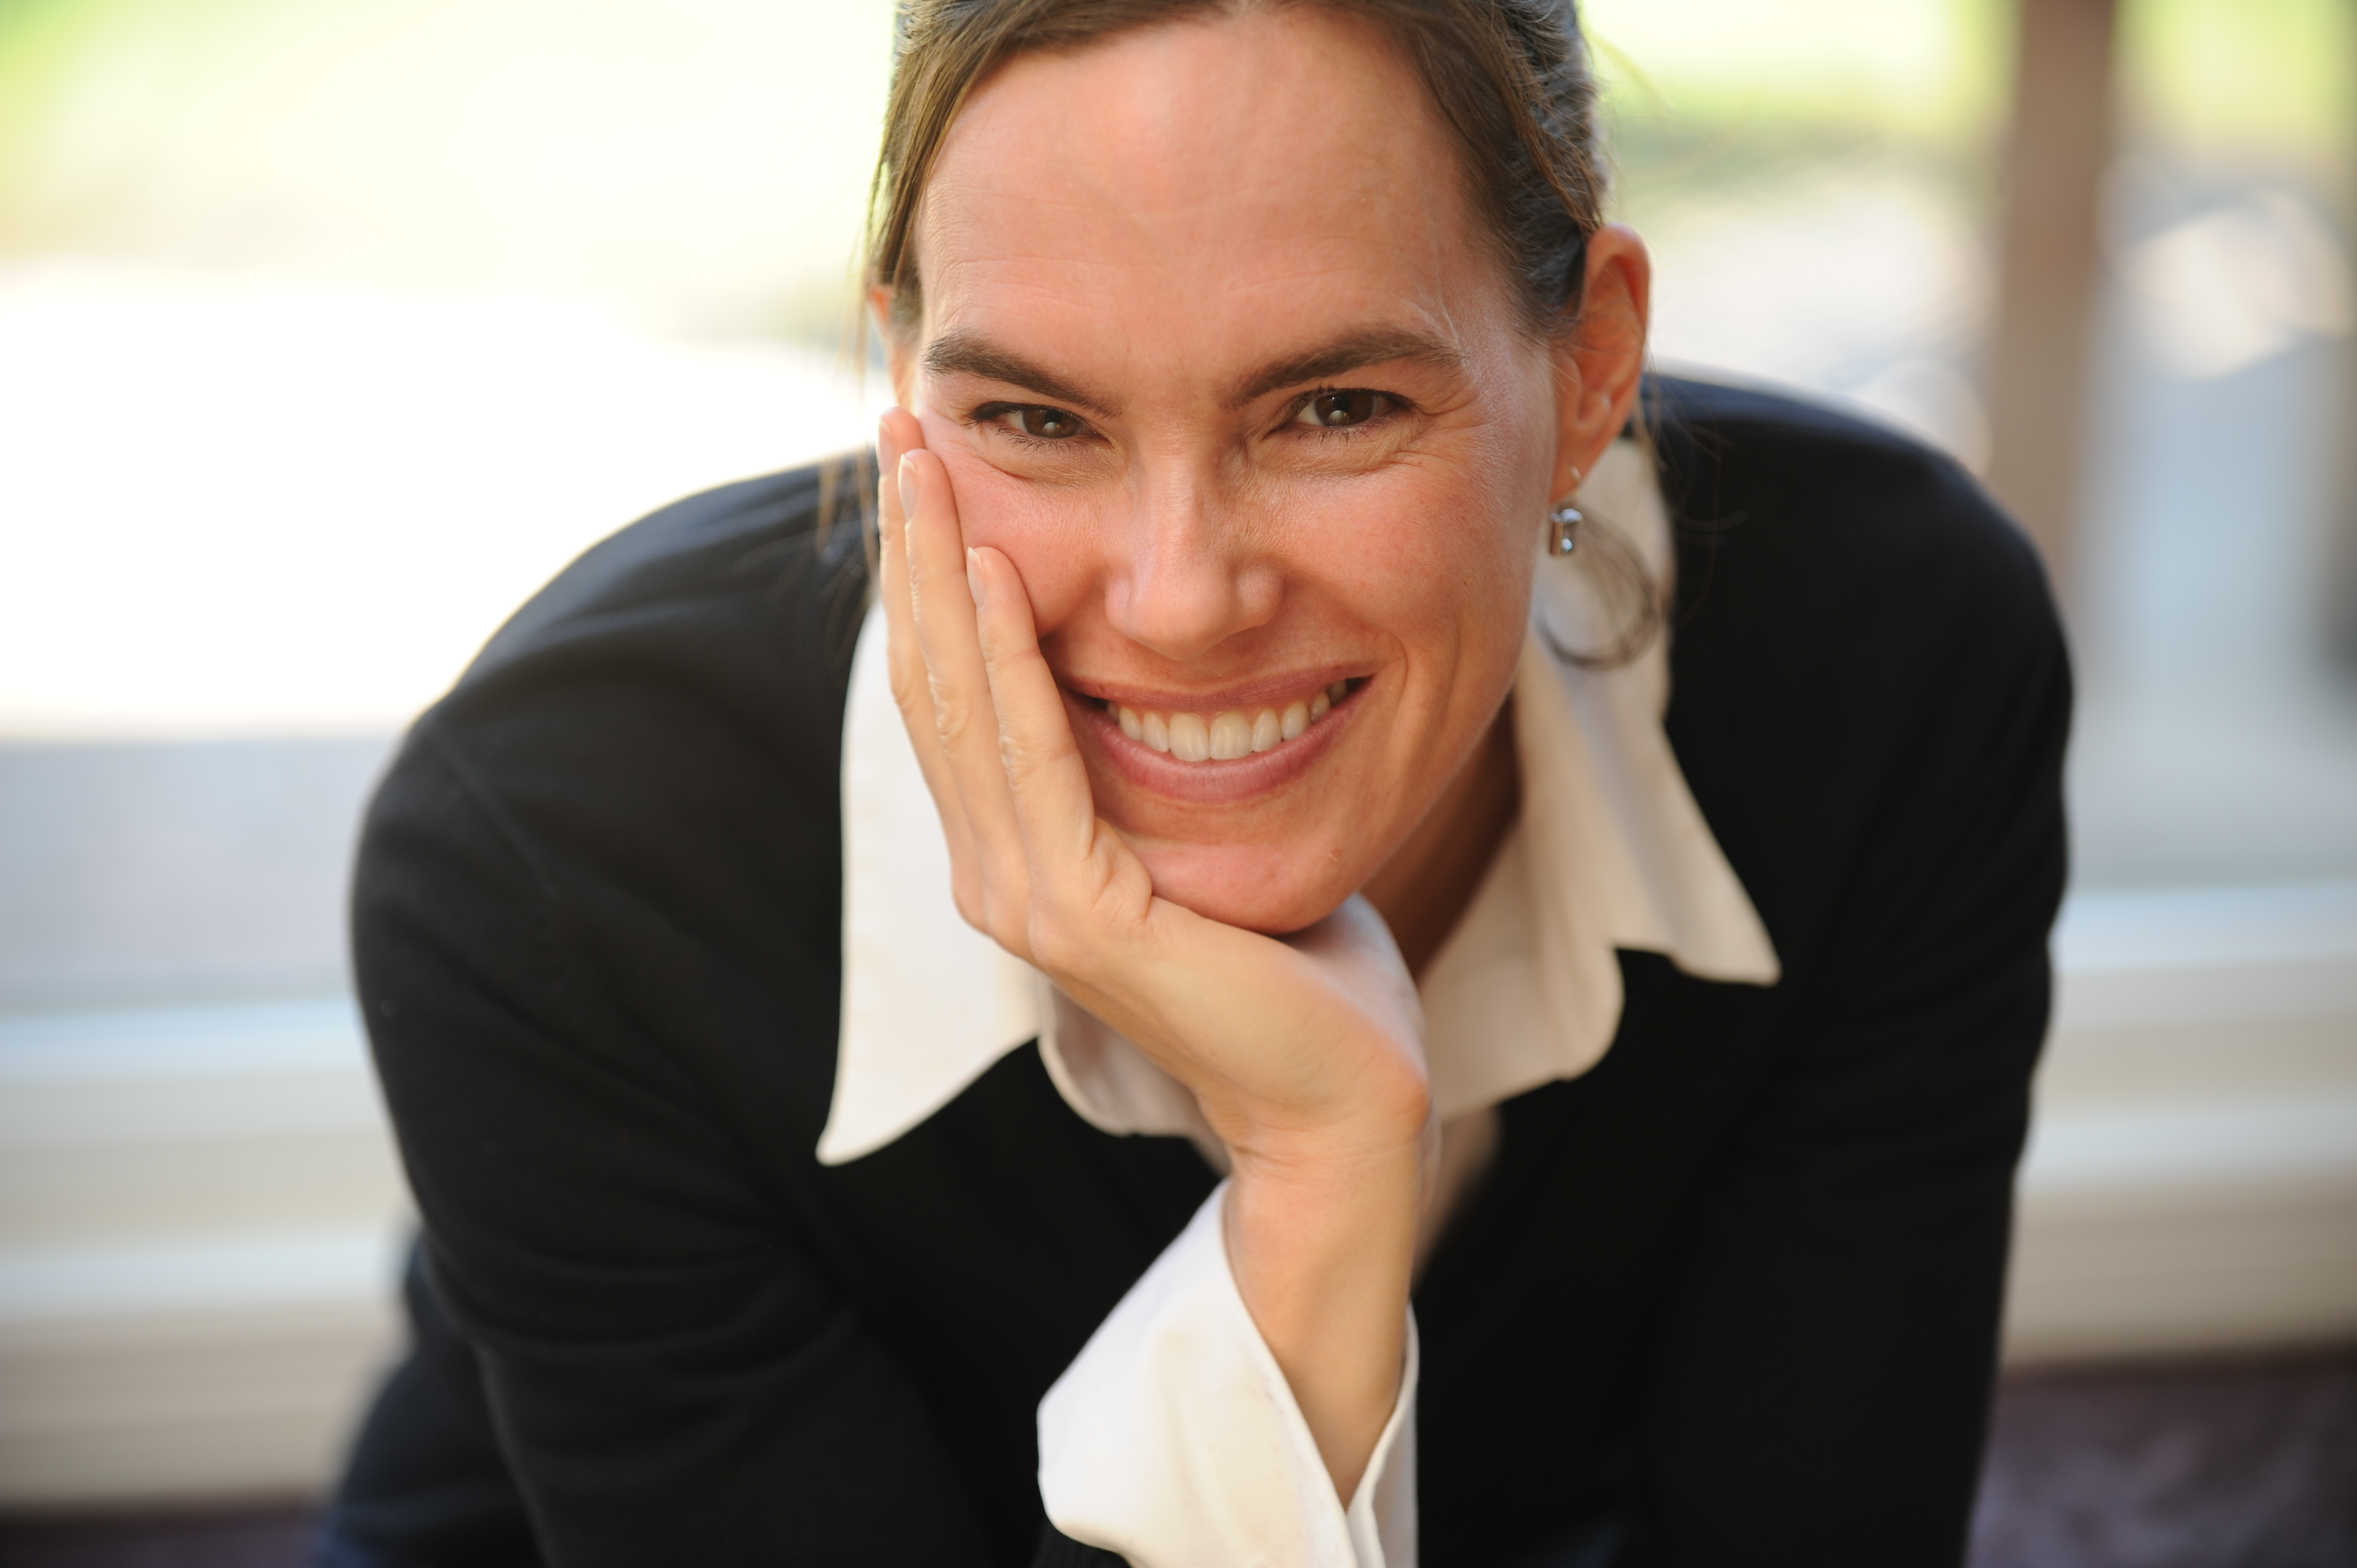 Dr. Andrea Charron